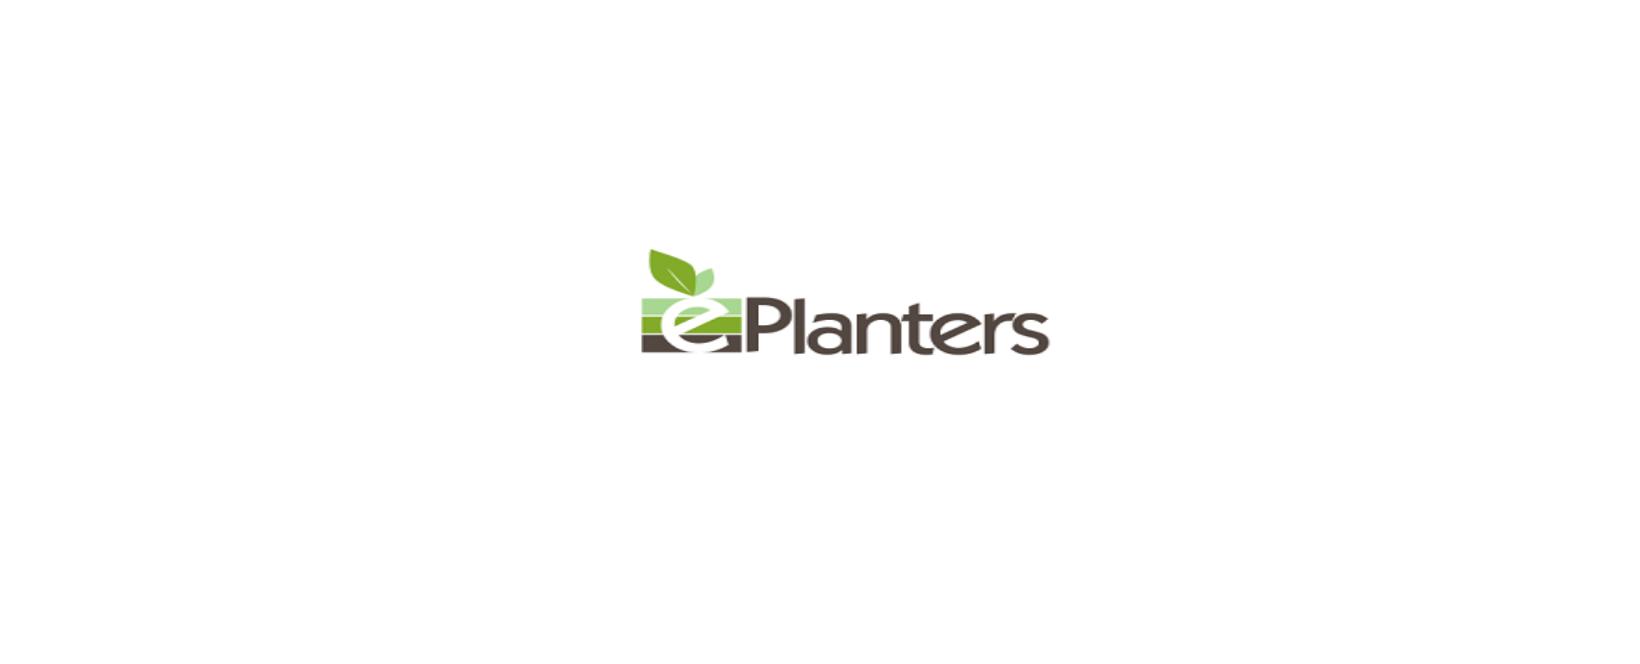 Eplanters Coupon Code 2021